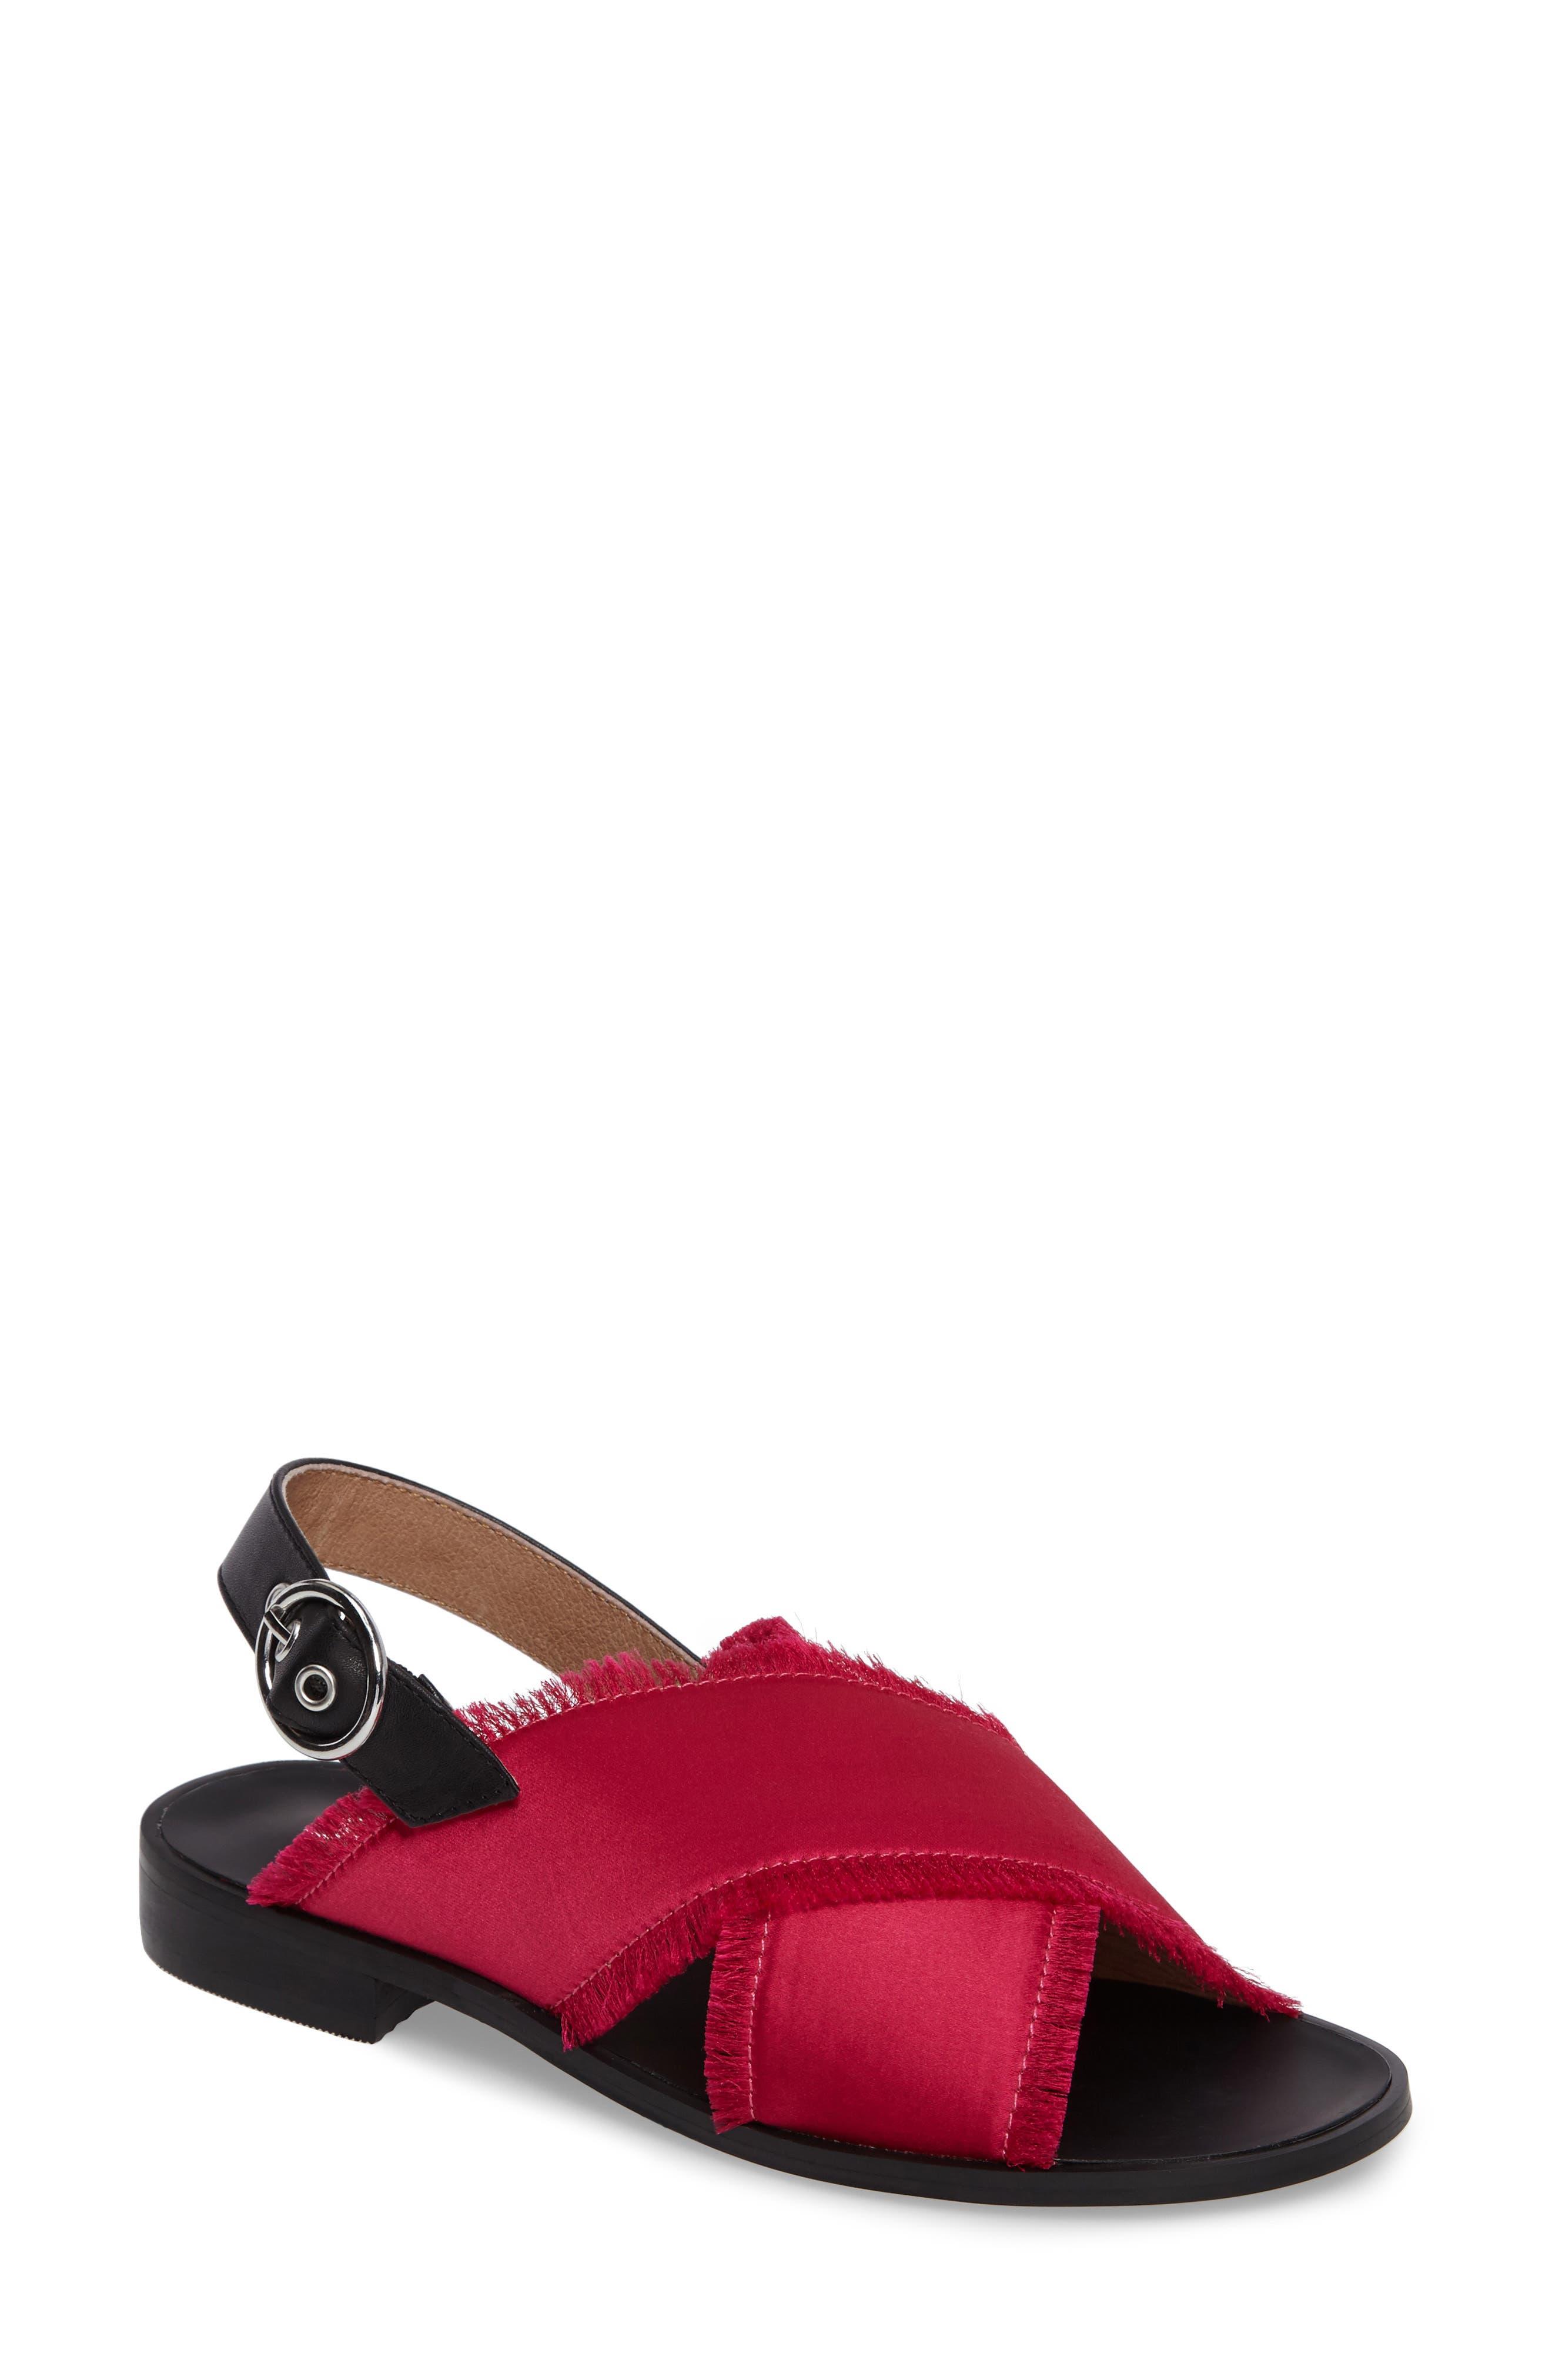 Endy Fringed Cross Strap Sandal,                         Main,                         color, Fuchsia